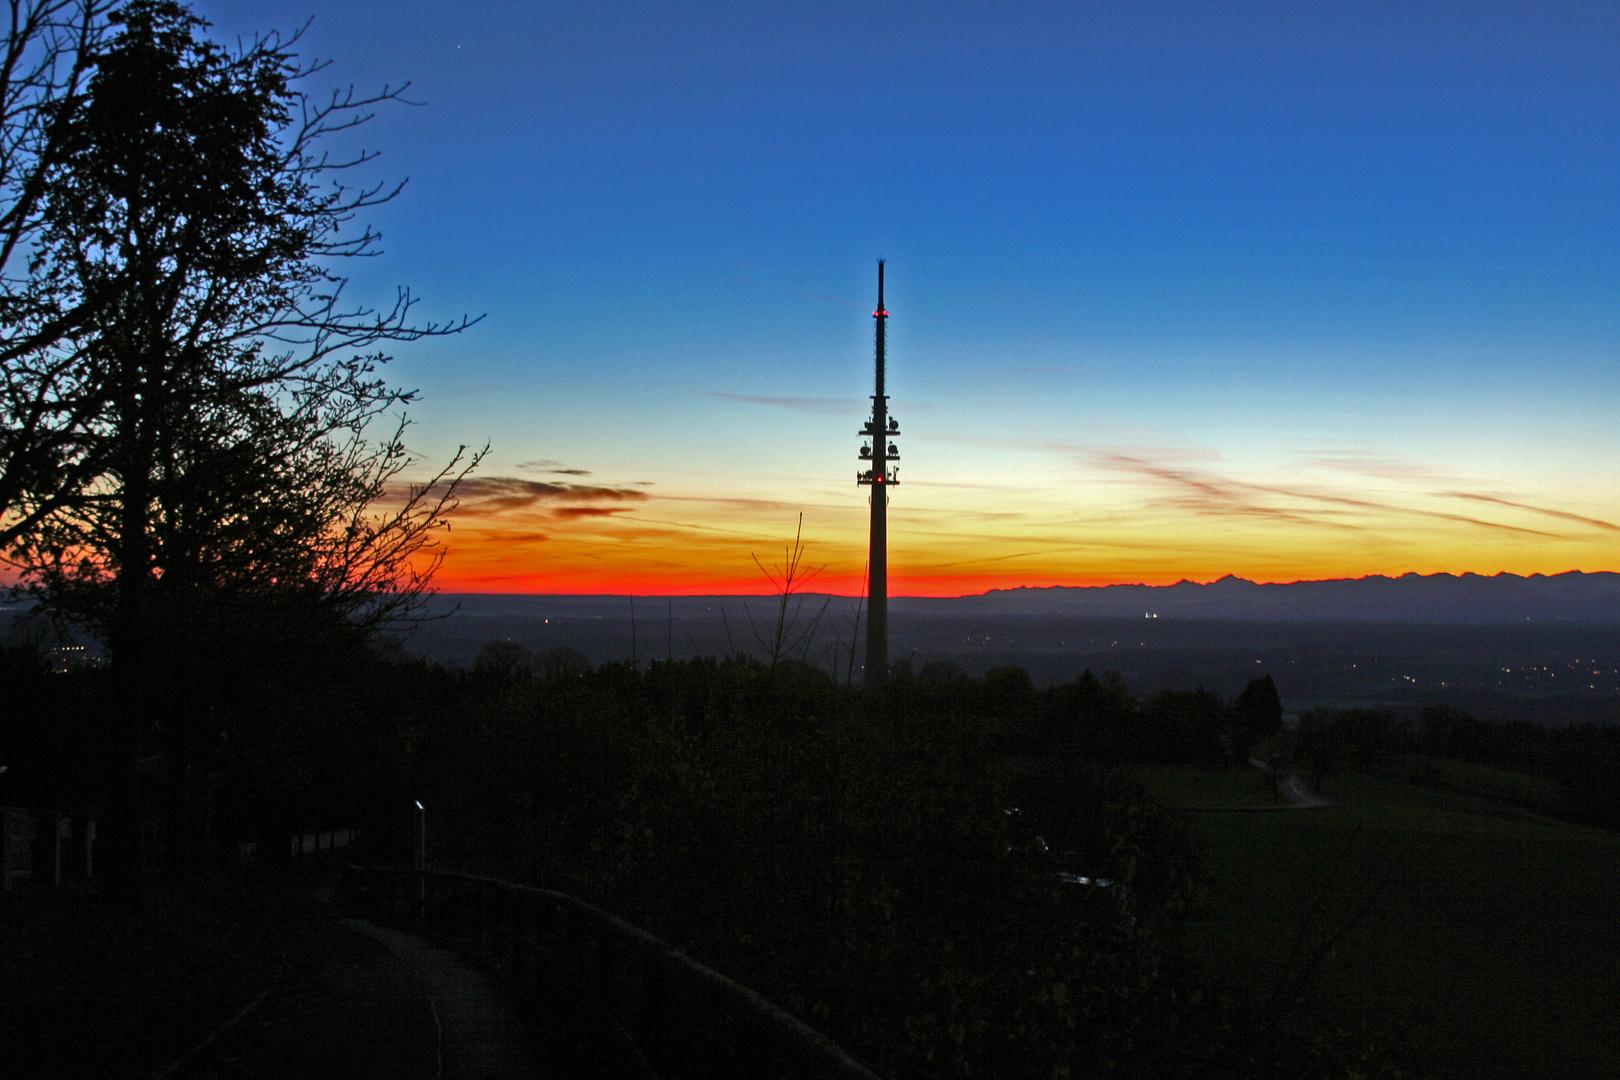 Sonnenaufgang am Hohenpeißenberg